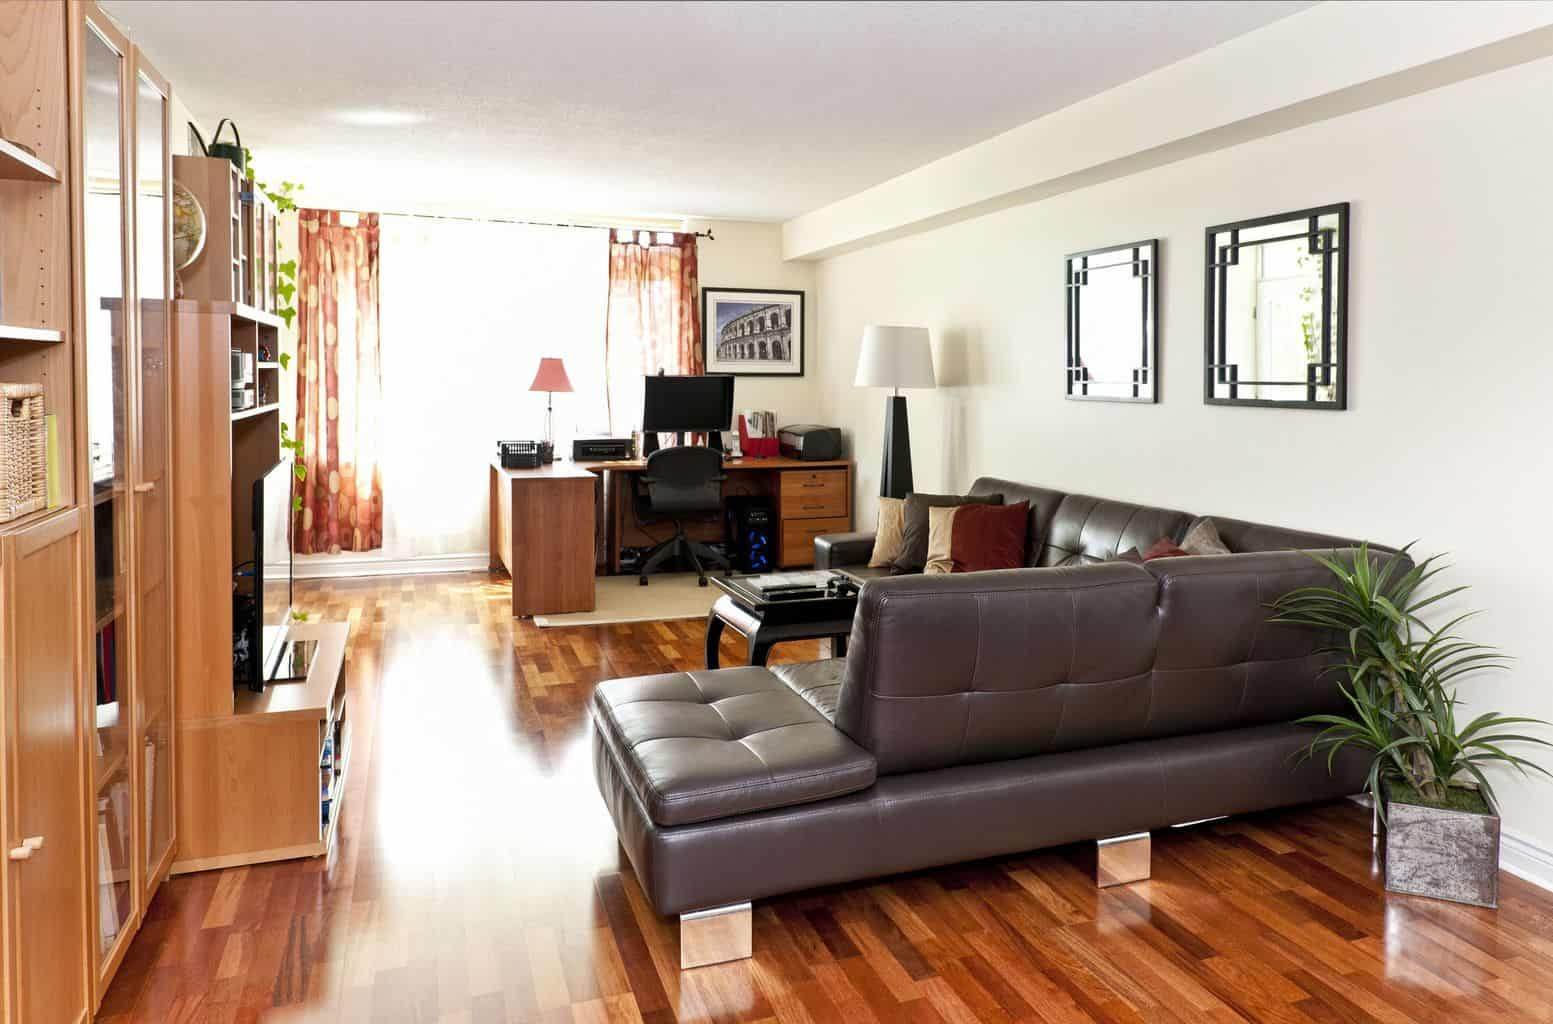 best wood cleaning floors design floor flooring furniture with in creative machine home interior hardwood acacia